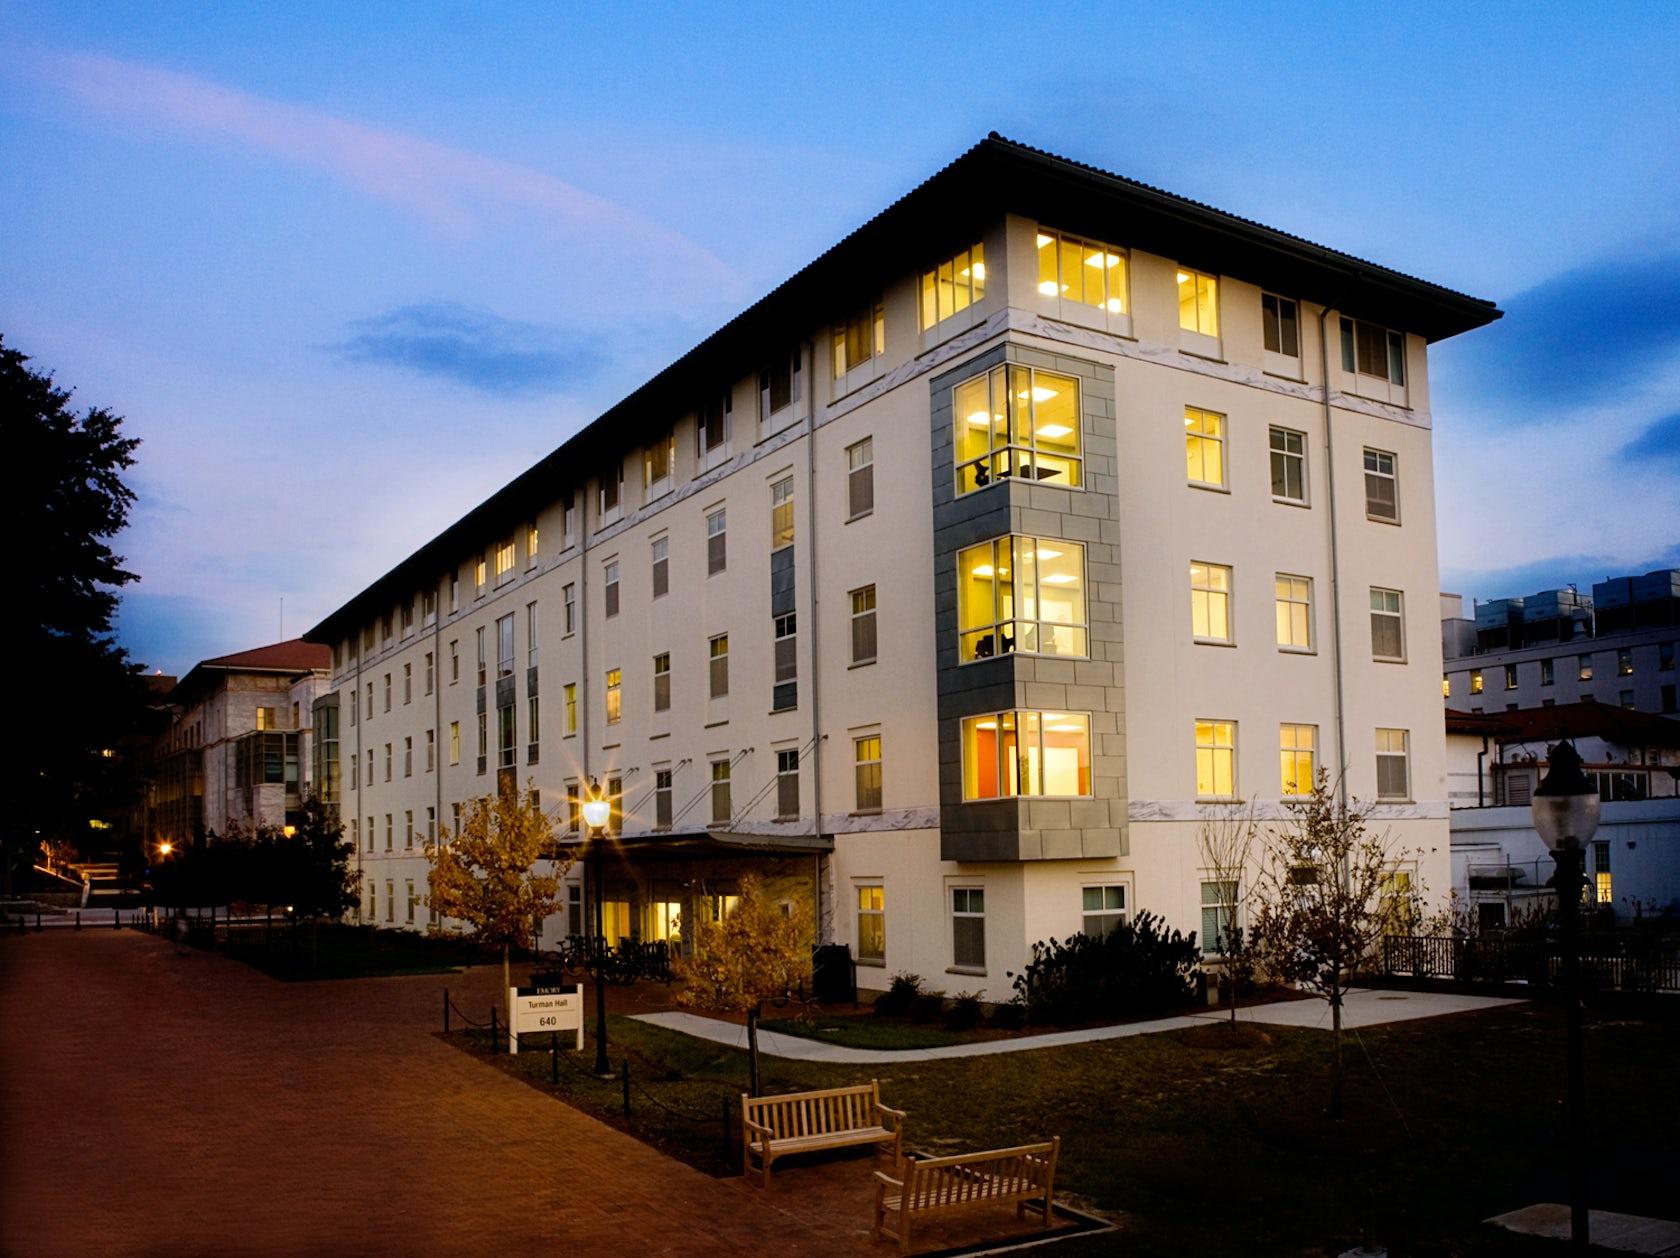 Duke School Of Nursing >> Emory University - Turman Residence Hall - Architizer